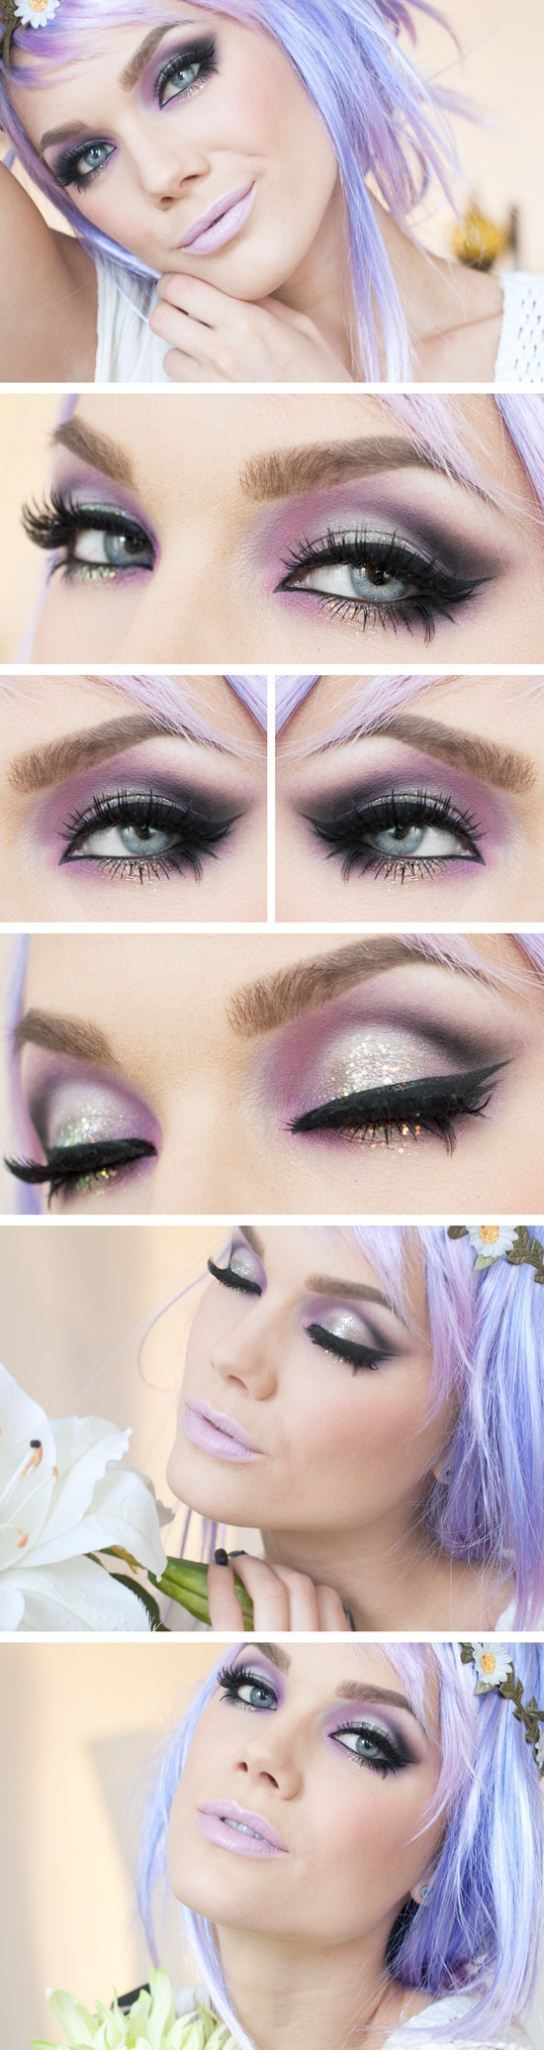 Beautiful eye shadow and a very pretty pale lilac lip it looks like